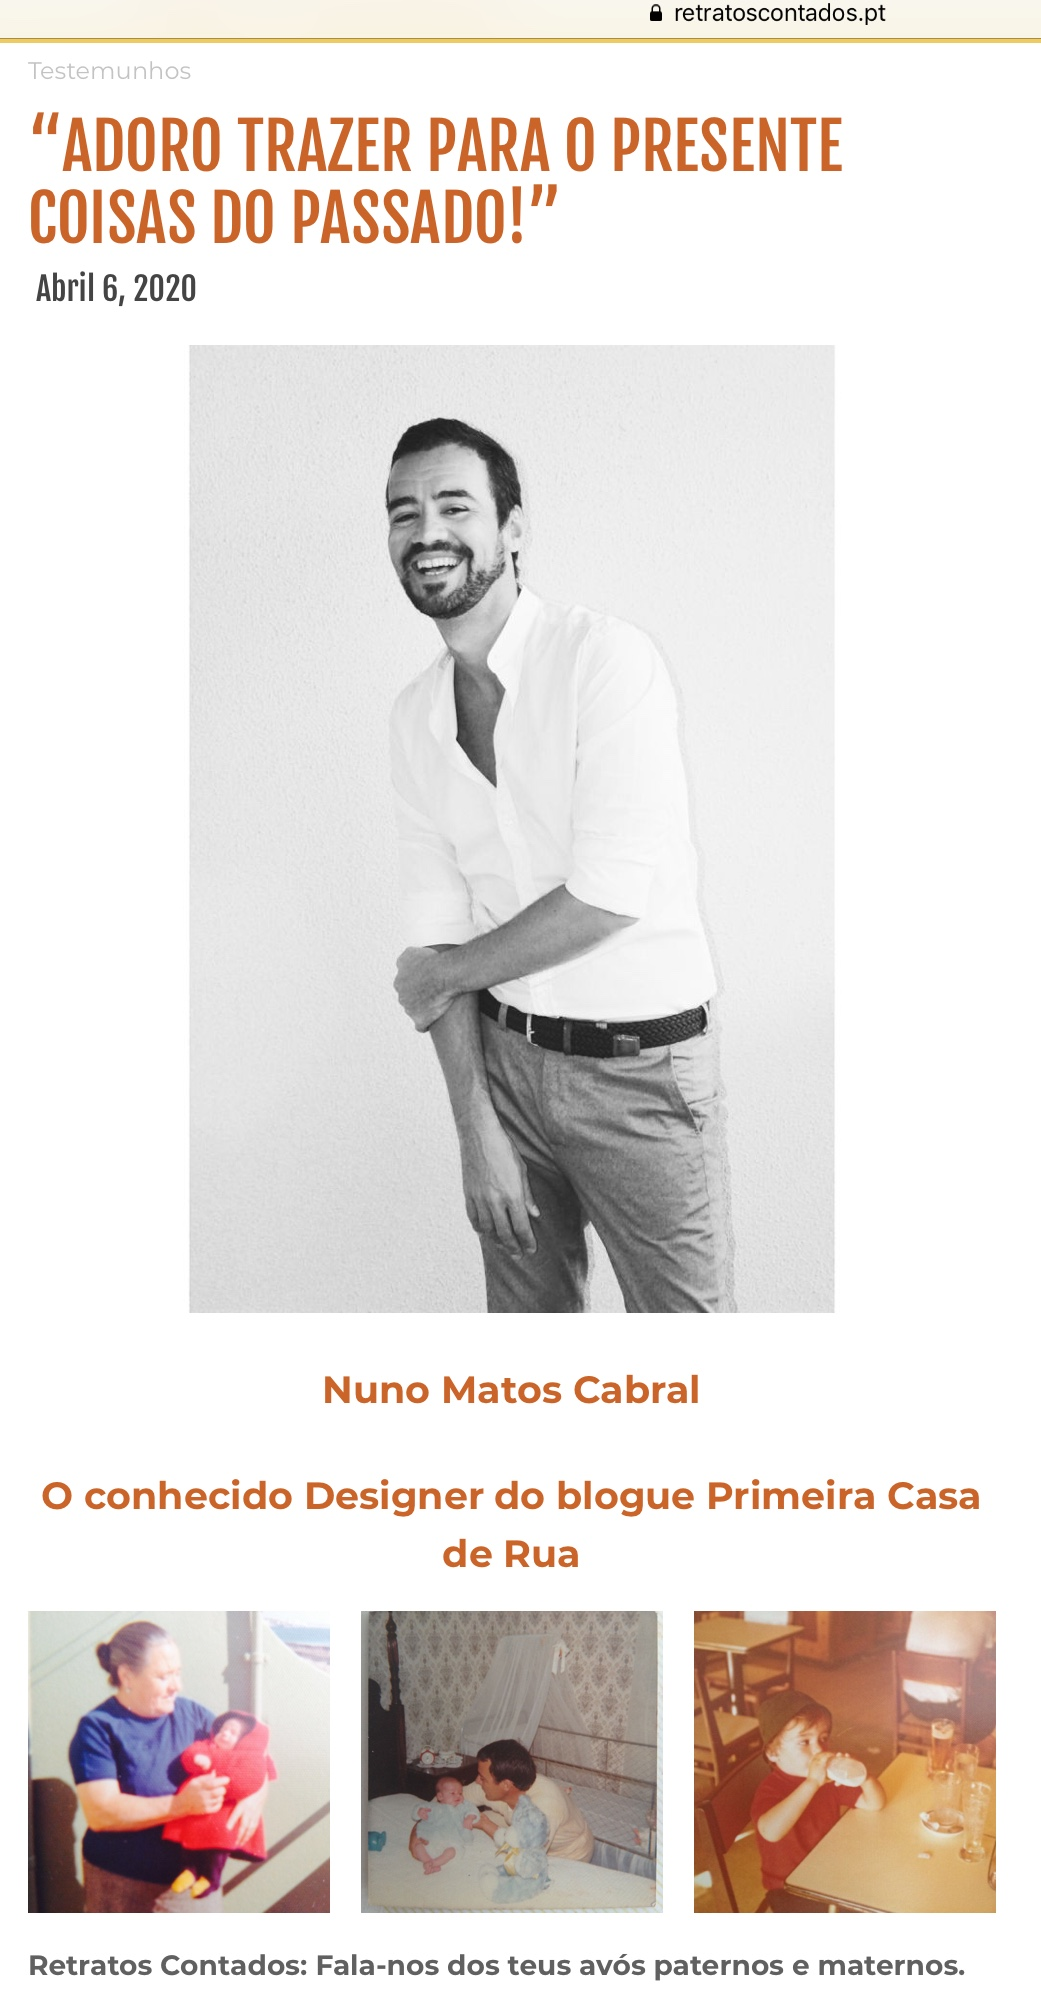 NUNO MATOS CABRAL @ RETRATOS CONTADOS